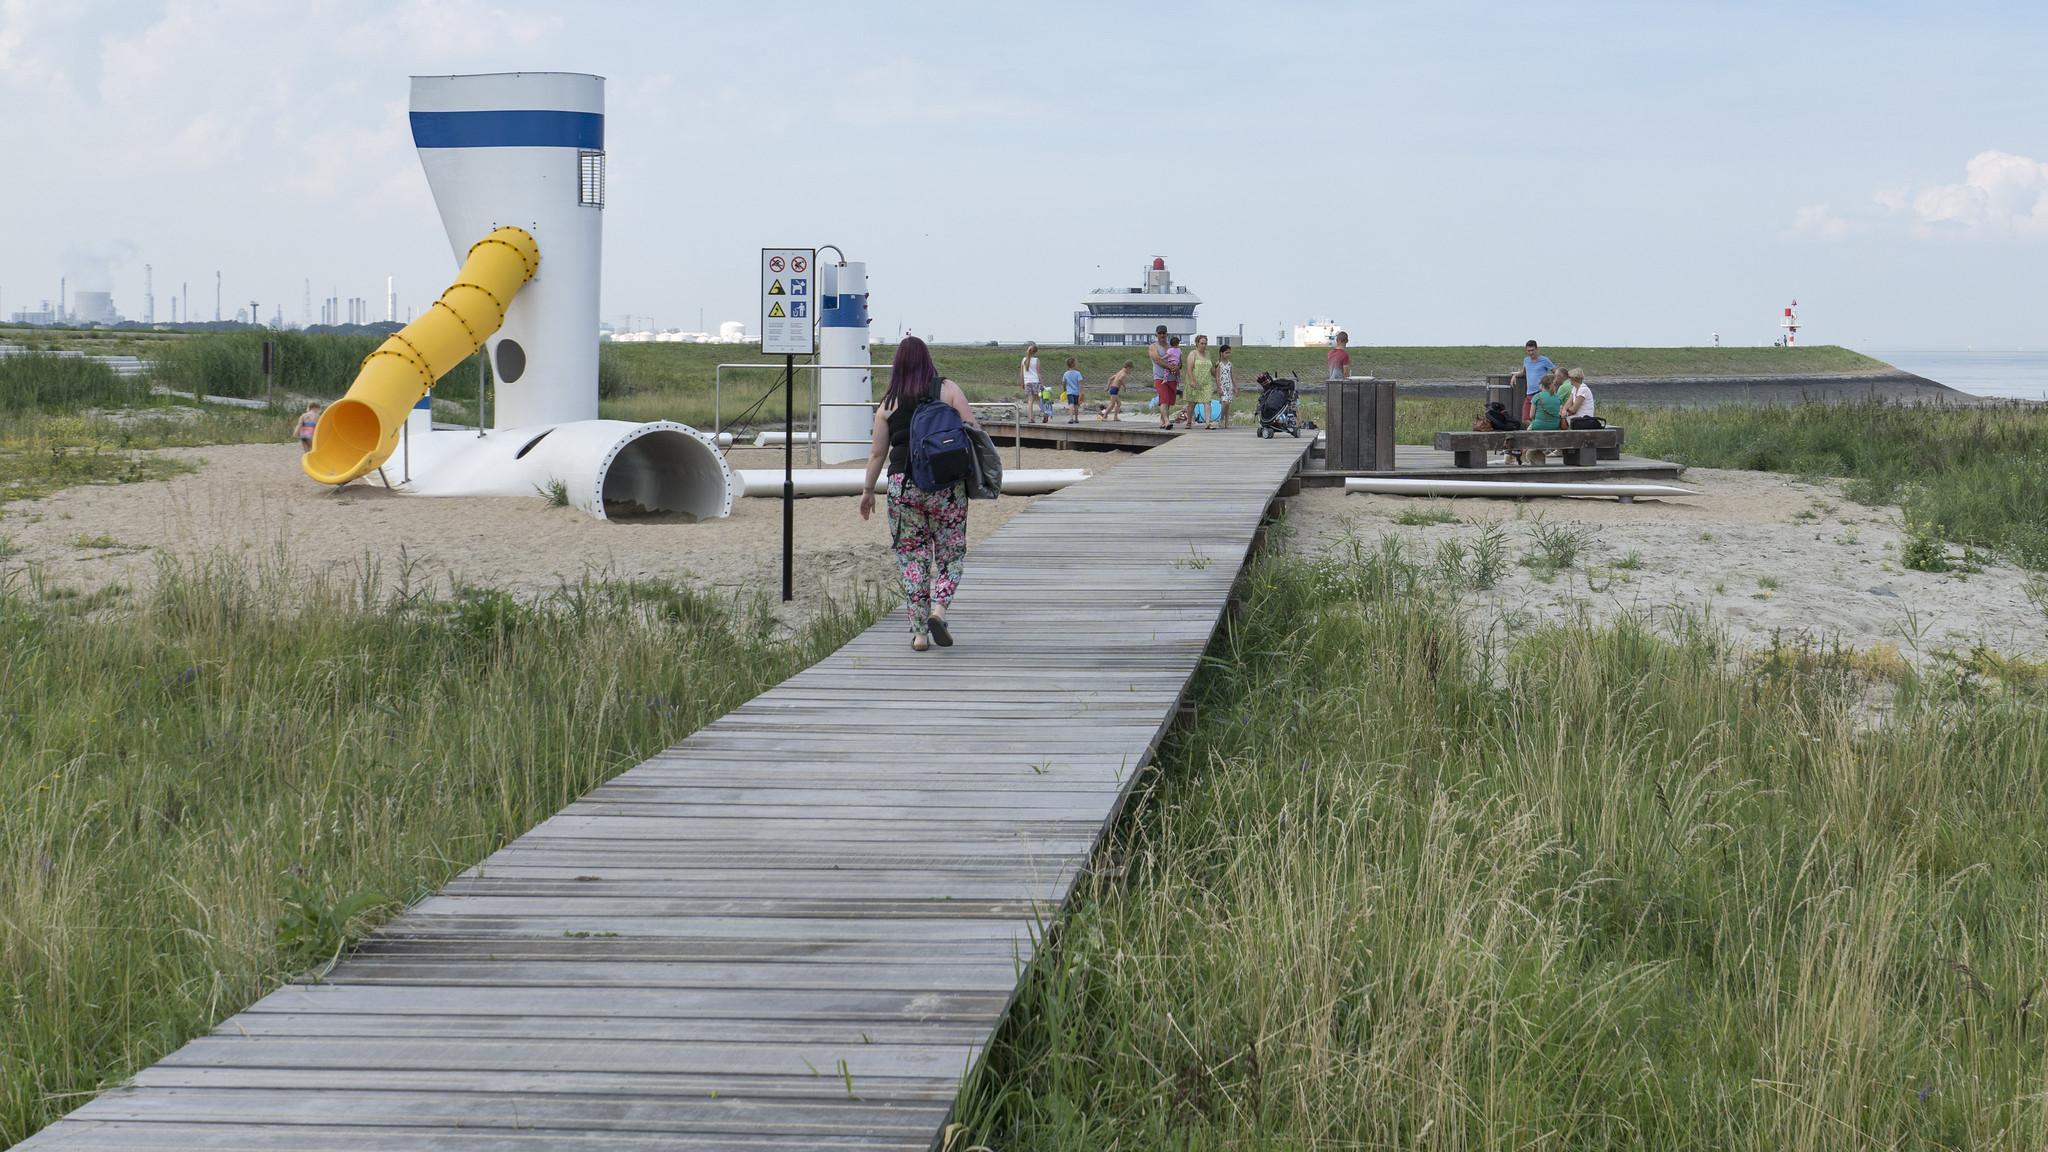 Boardwalk towards the playground.